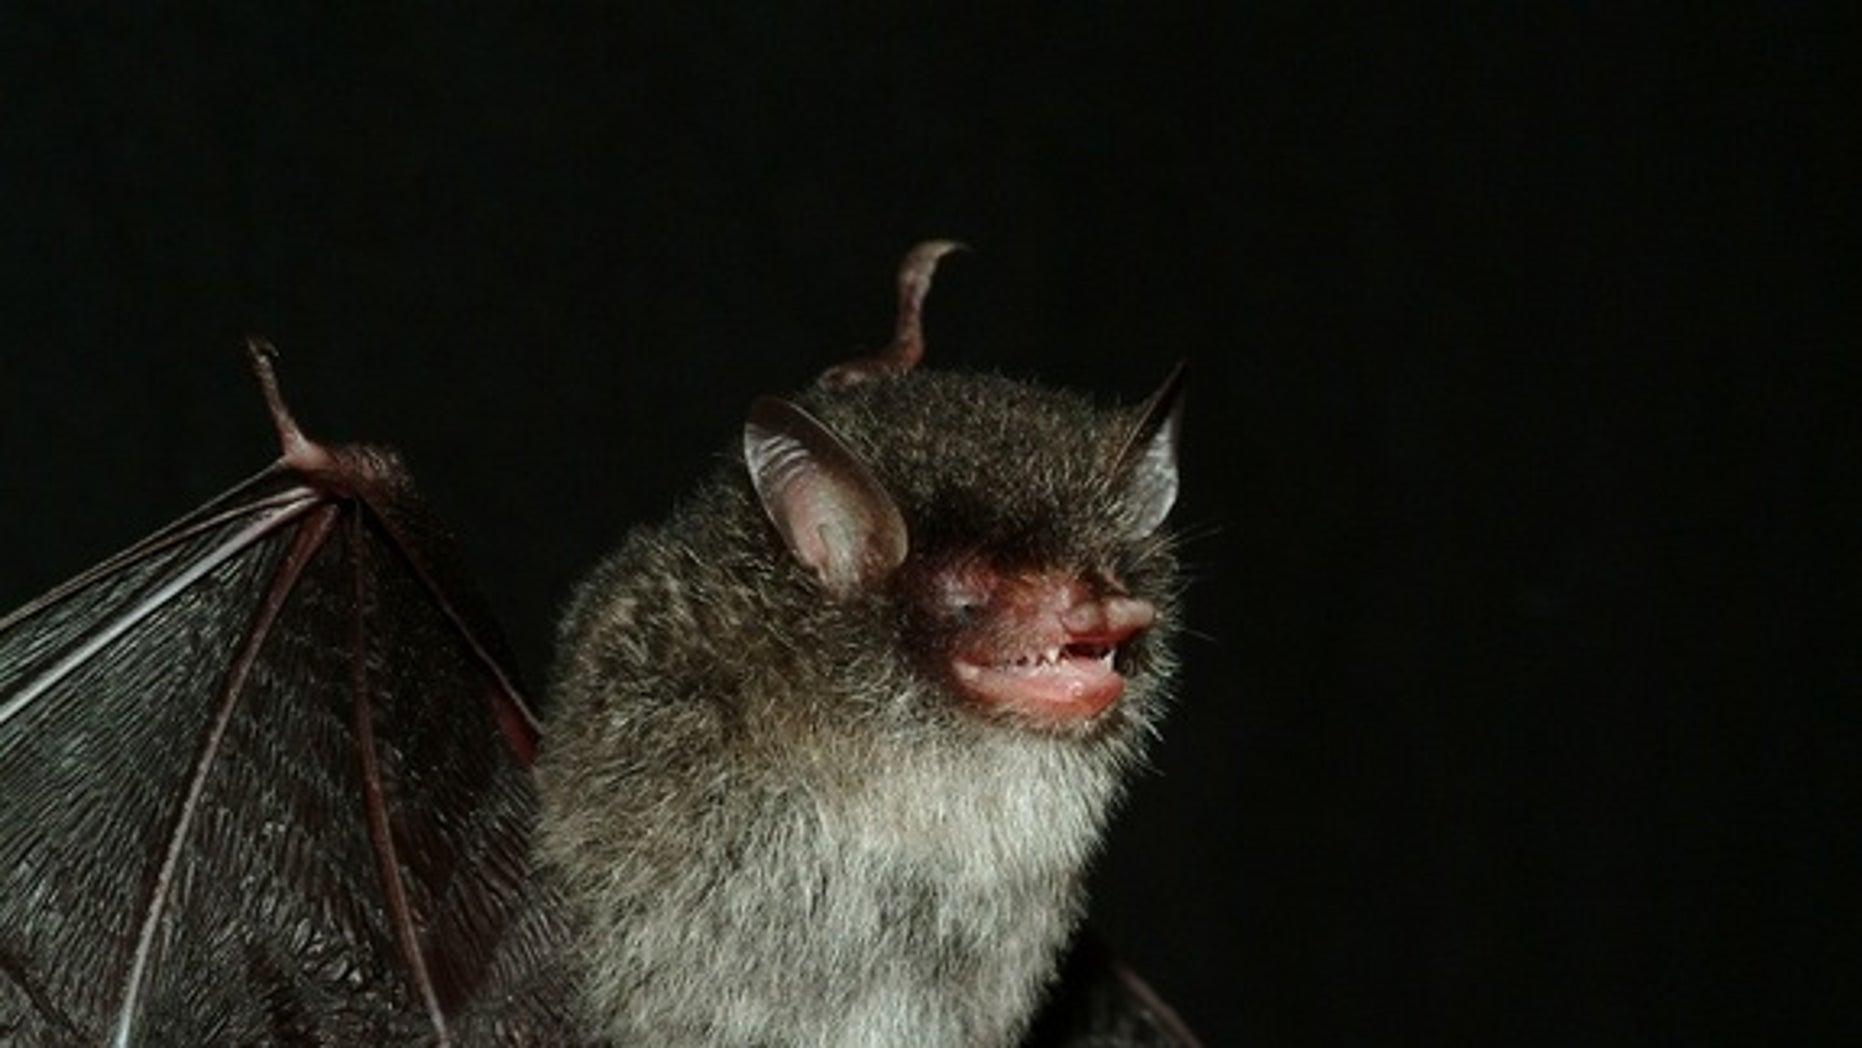 Beelzebub's tube-nosed bat